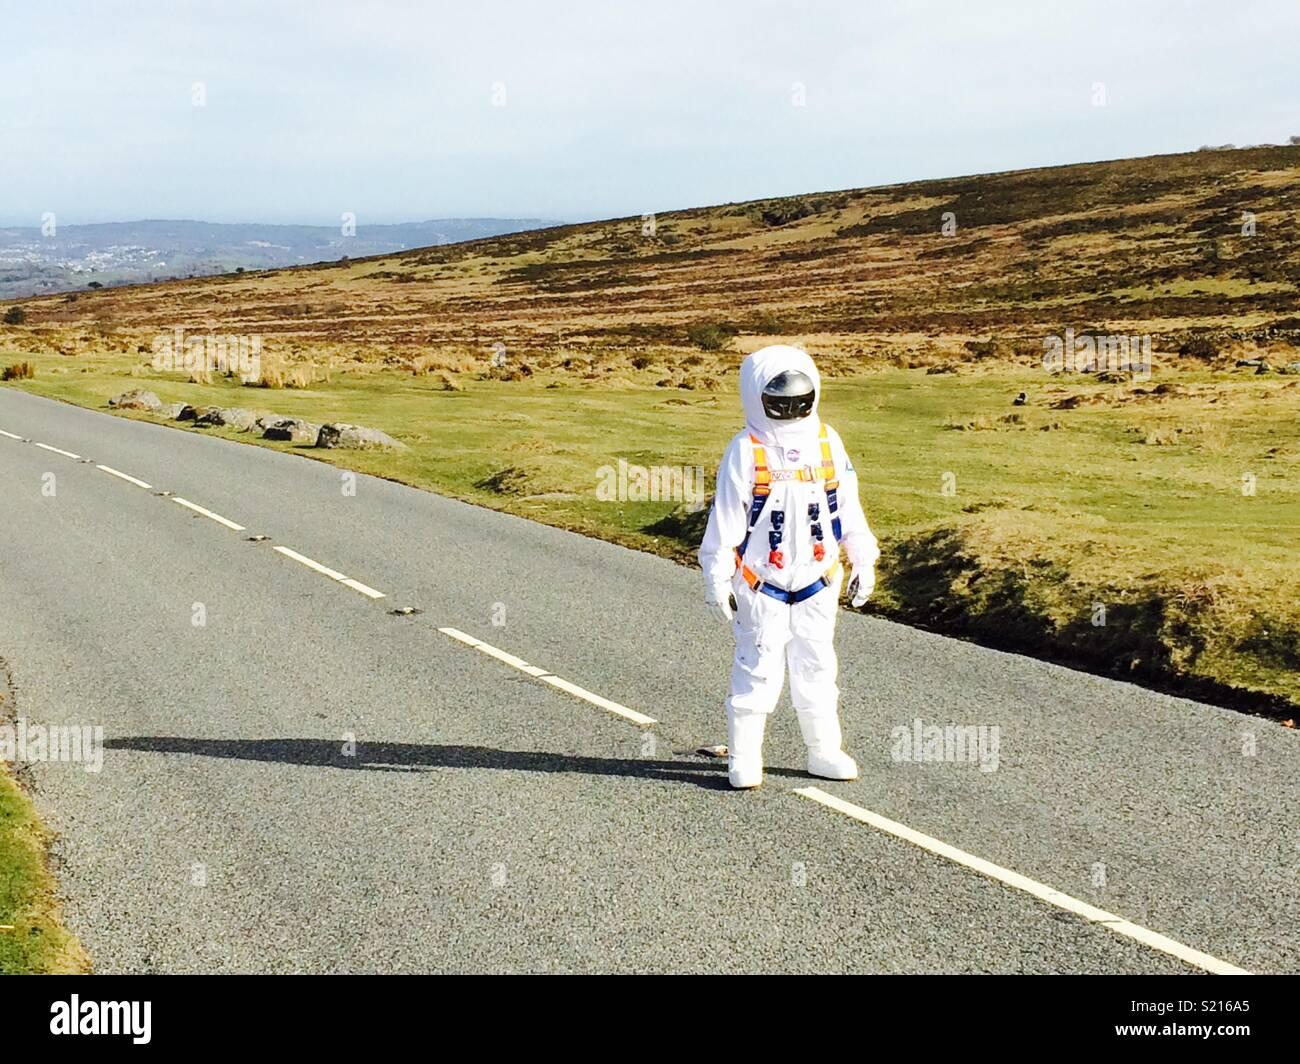 Astronauta en la carretera Imagen De Stock